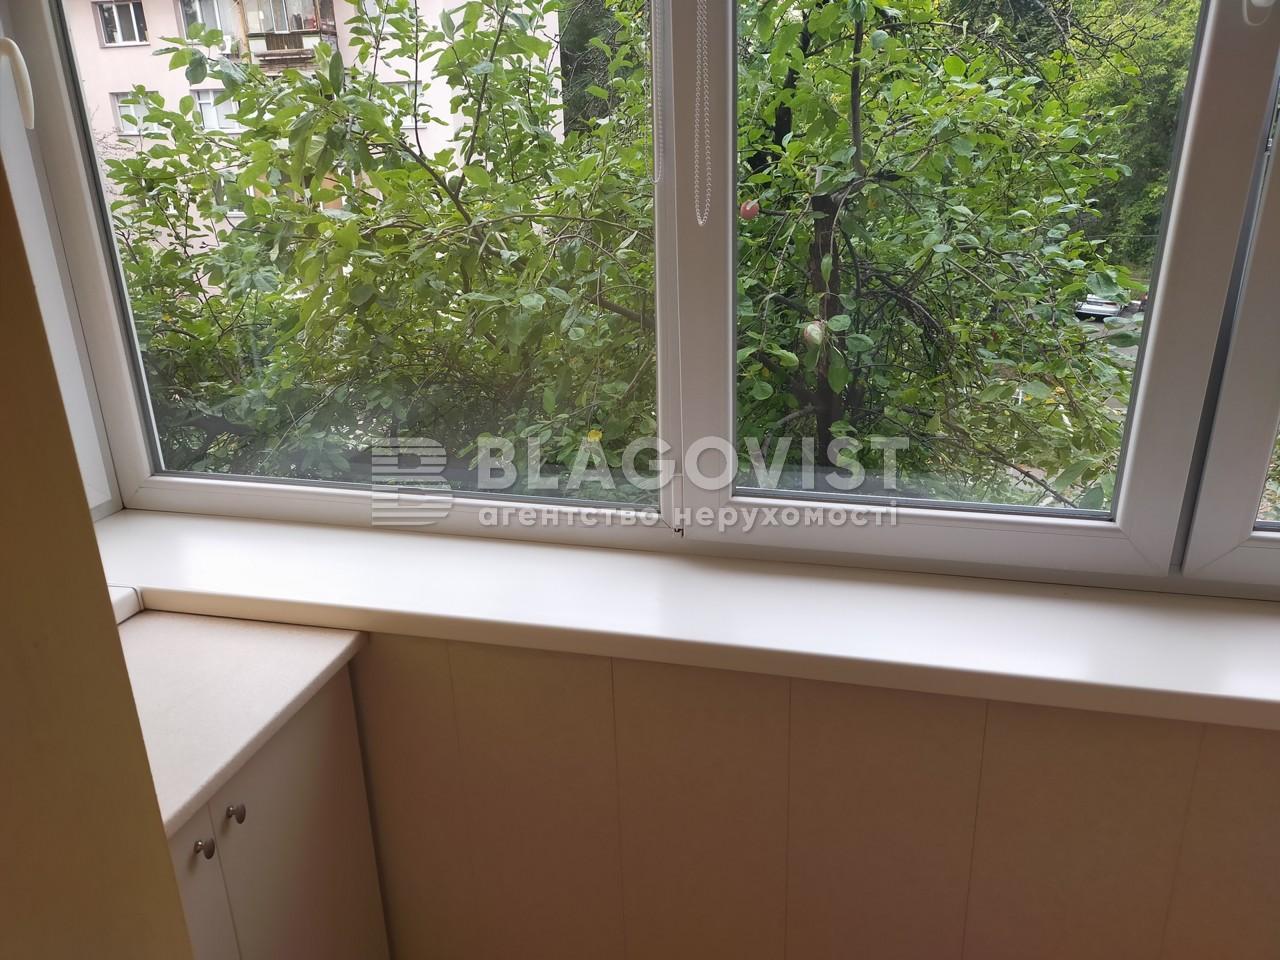 Квартира M-39350, Неманская, 6, Киев - Фото 13